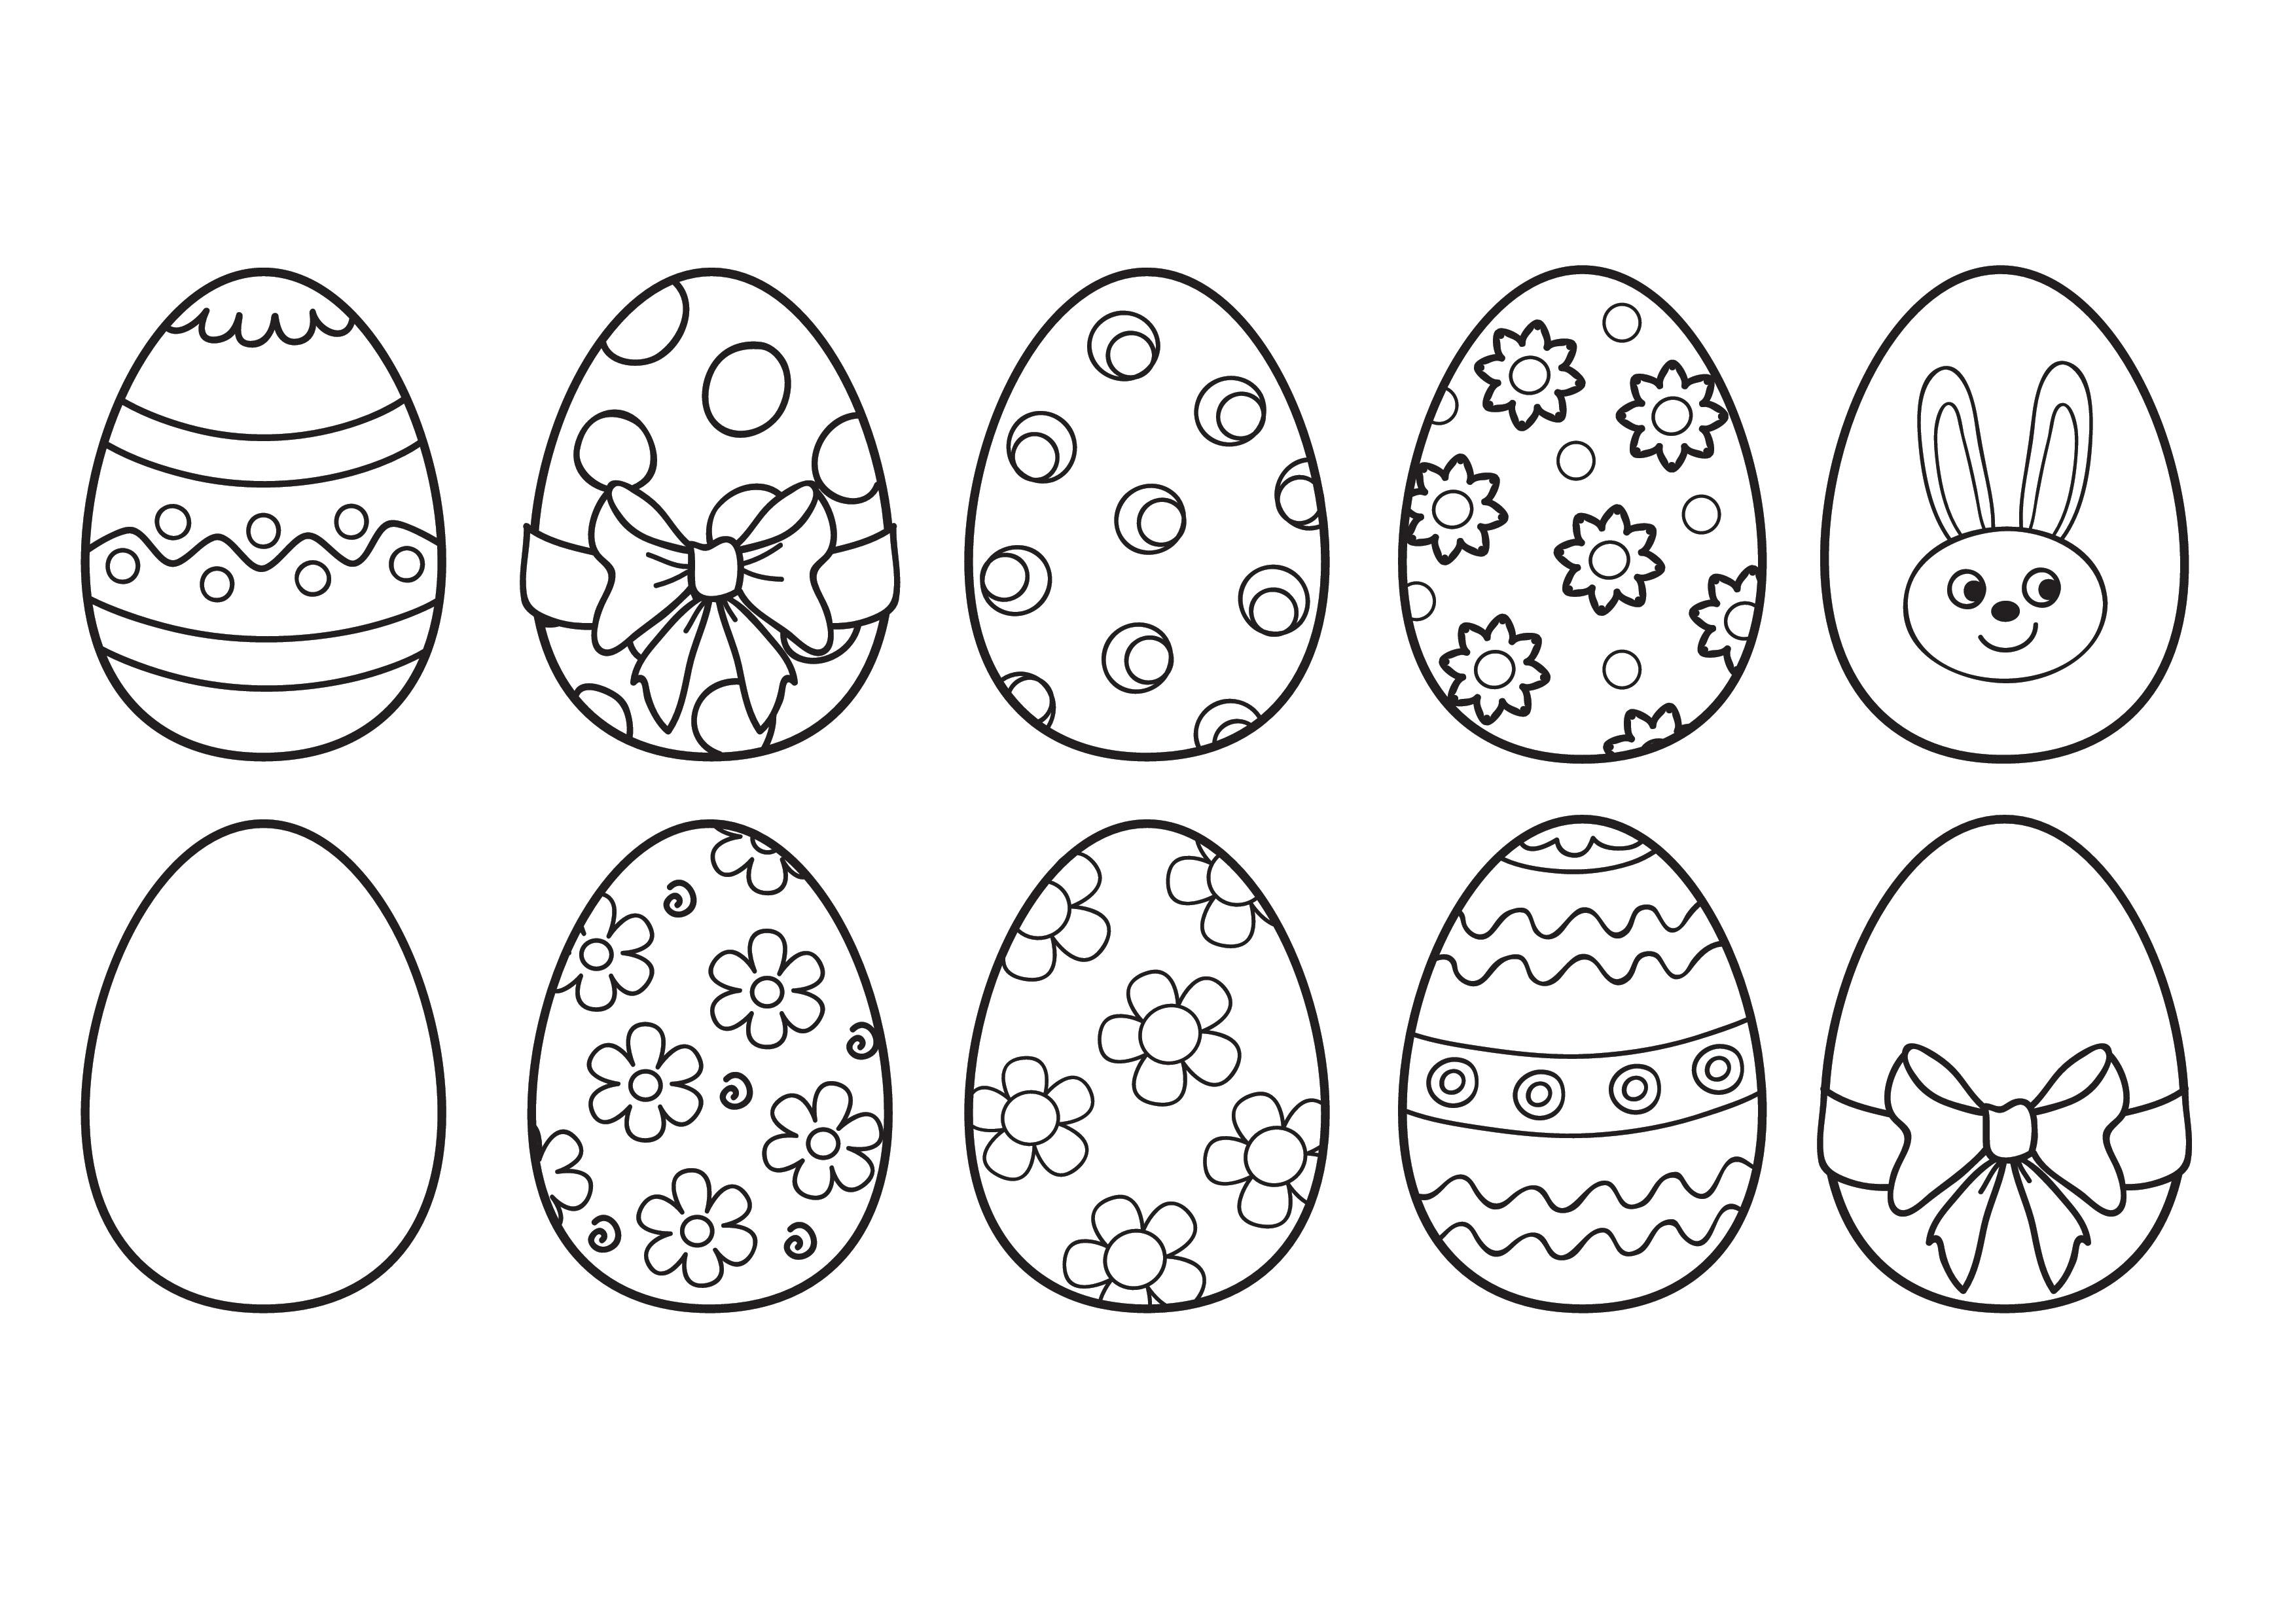 Dibujo De Cesta Simple De Pascua Con Huevos Para Colorear Dibujos